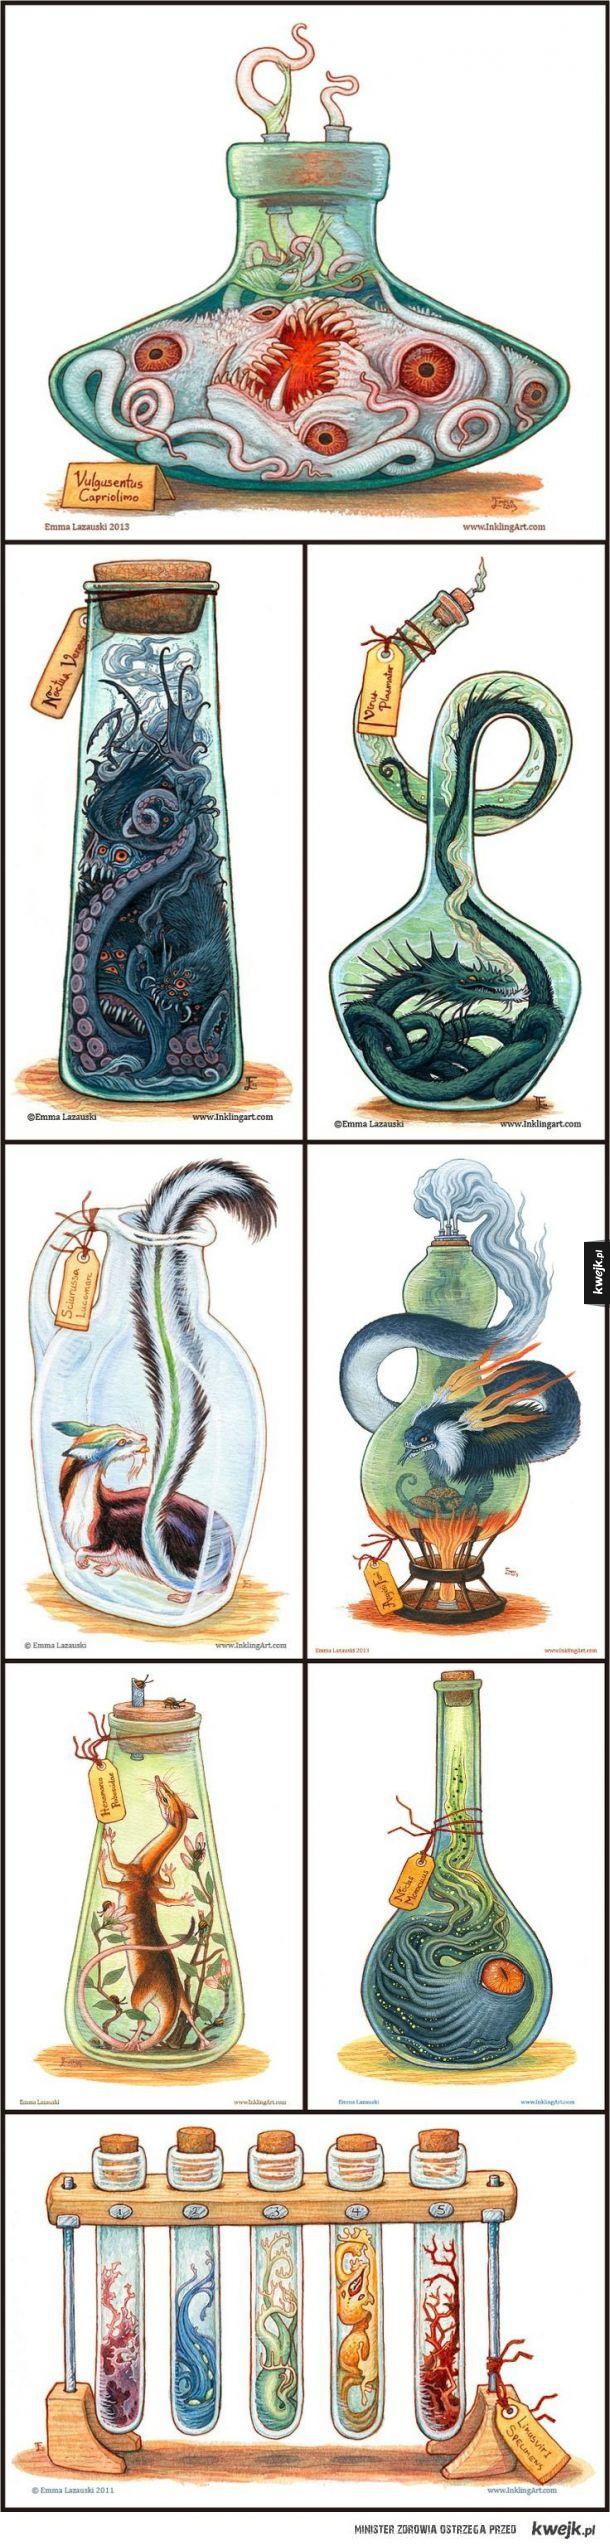 Butelkowe potwory